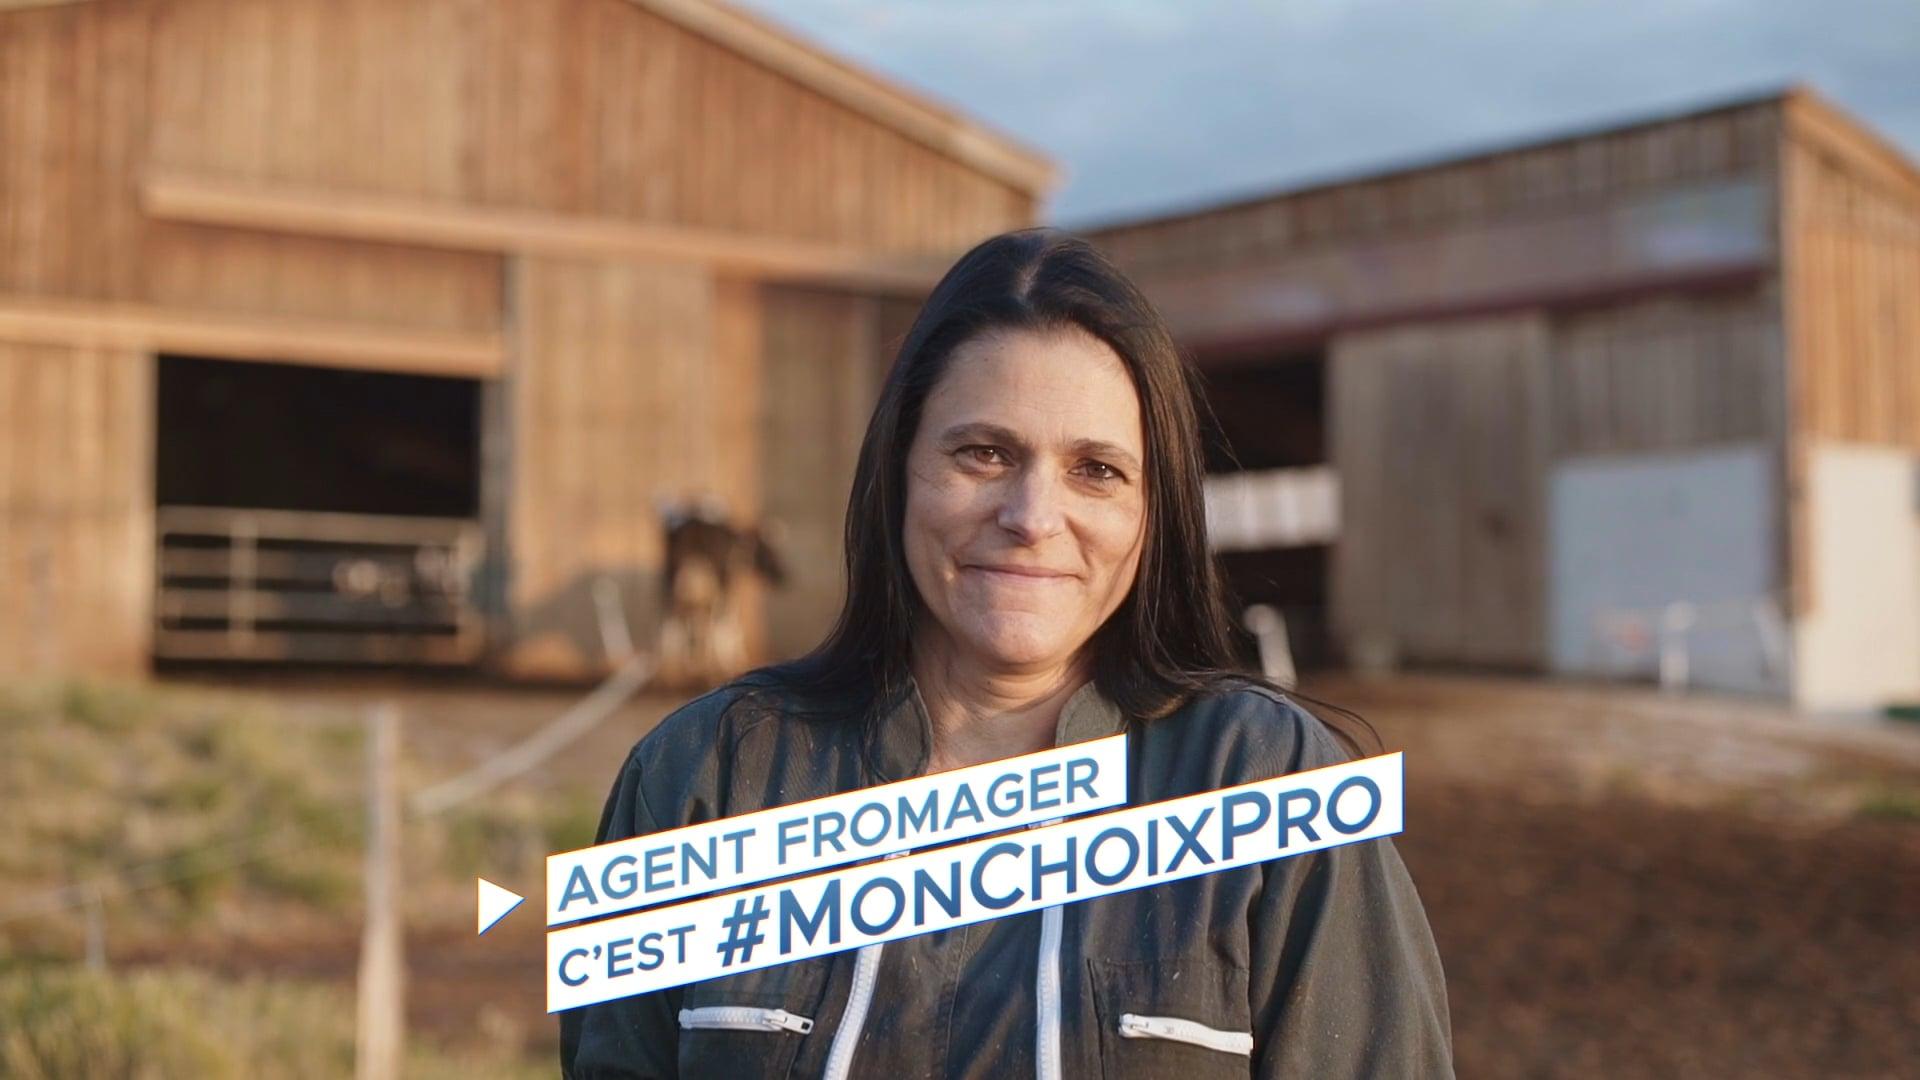 #MONCHOIXPRO | Agent Fromager AOP